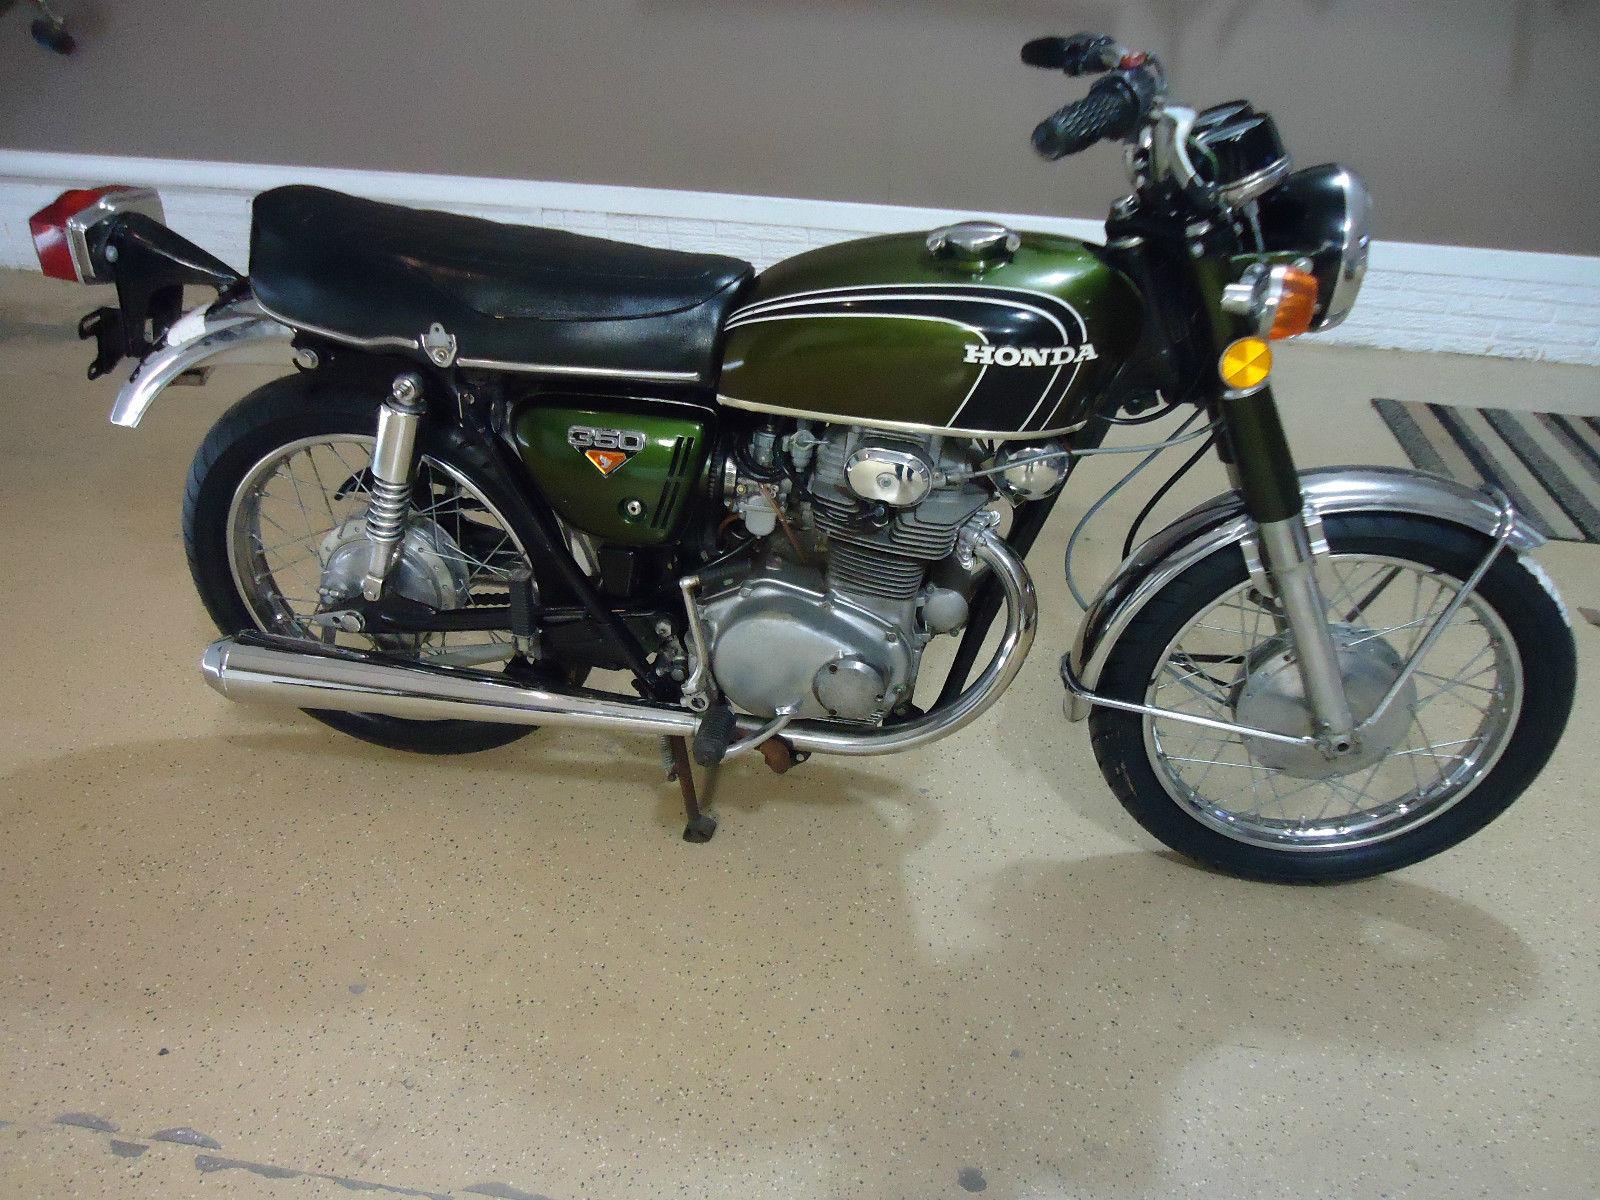 72 Cb350 Beginner Build 1970 Honda Ct70 Throttle Cable S L1600